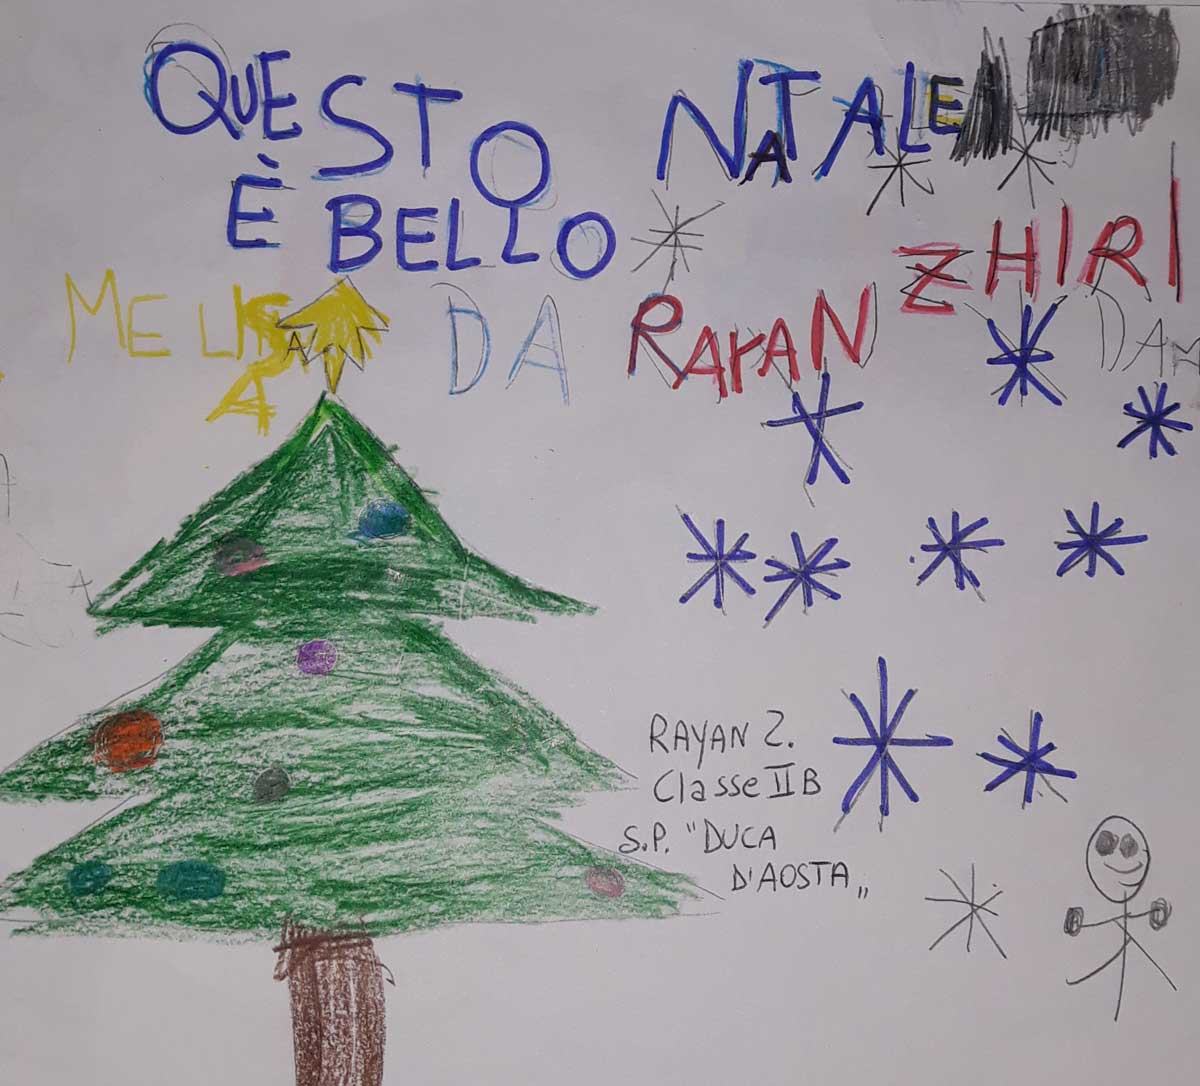 56.-L'-AMORE-a-Natale-allontana-ogni-male!_Rayan